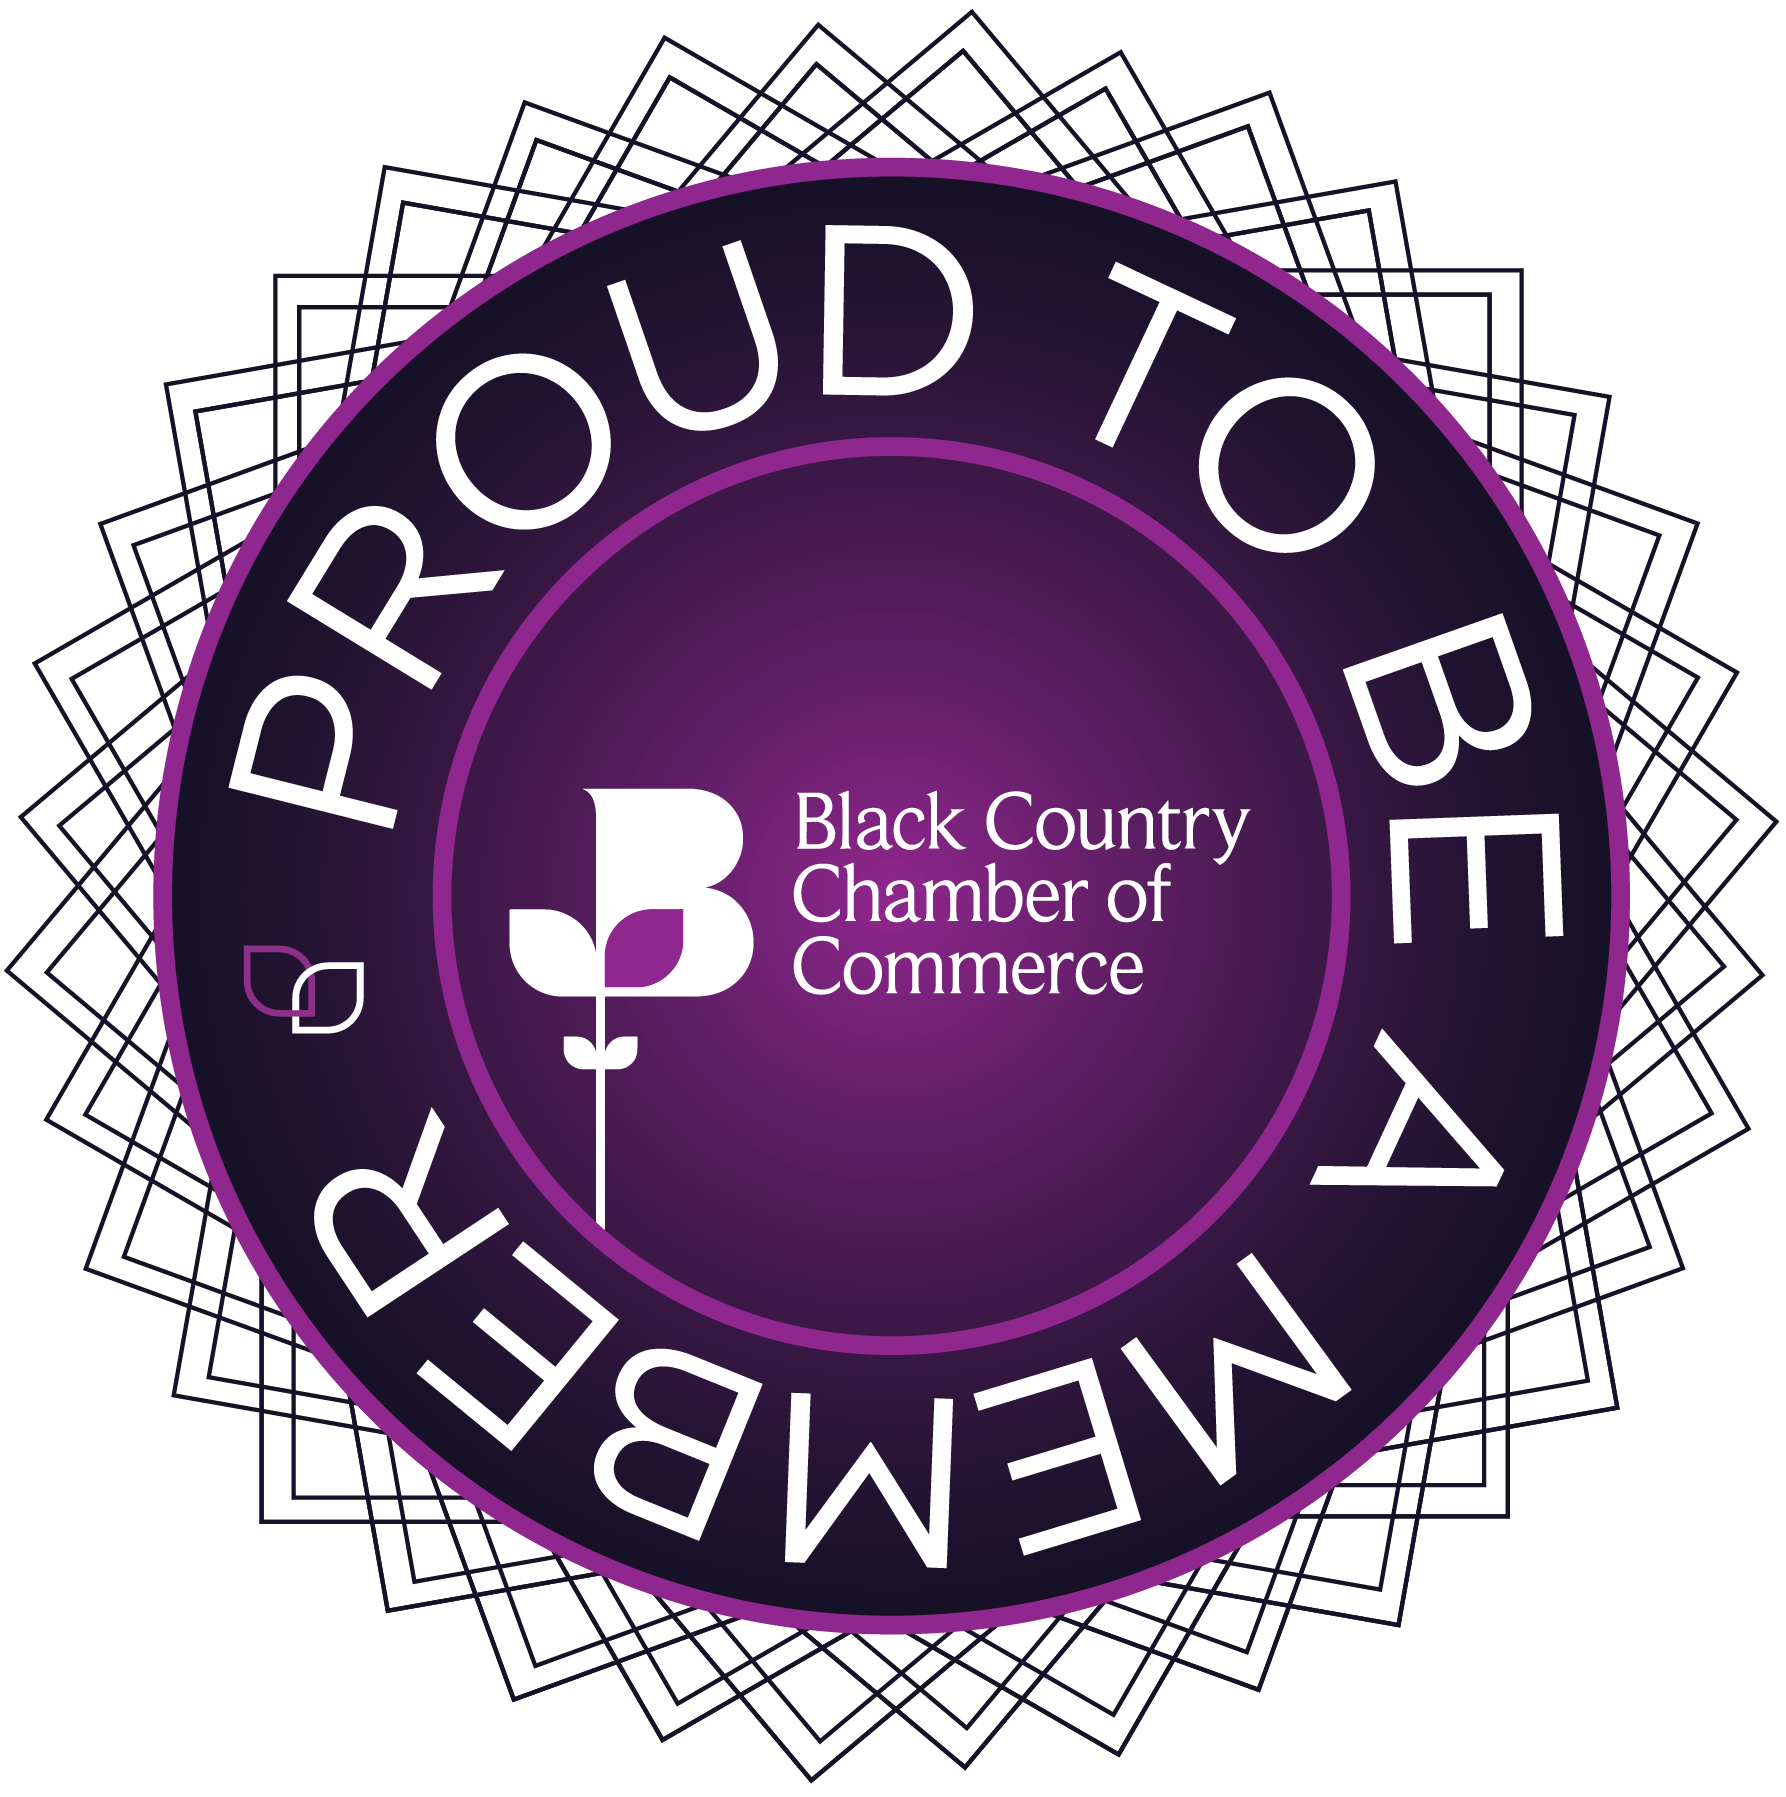 Black Country Chamber of Commerce Member